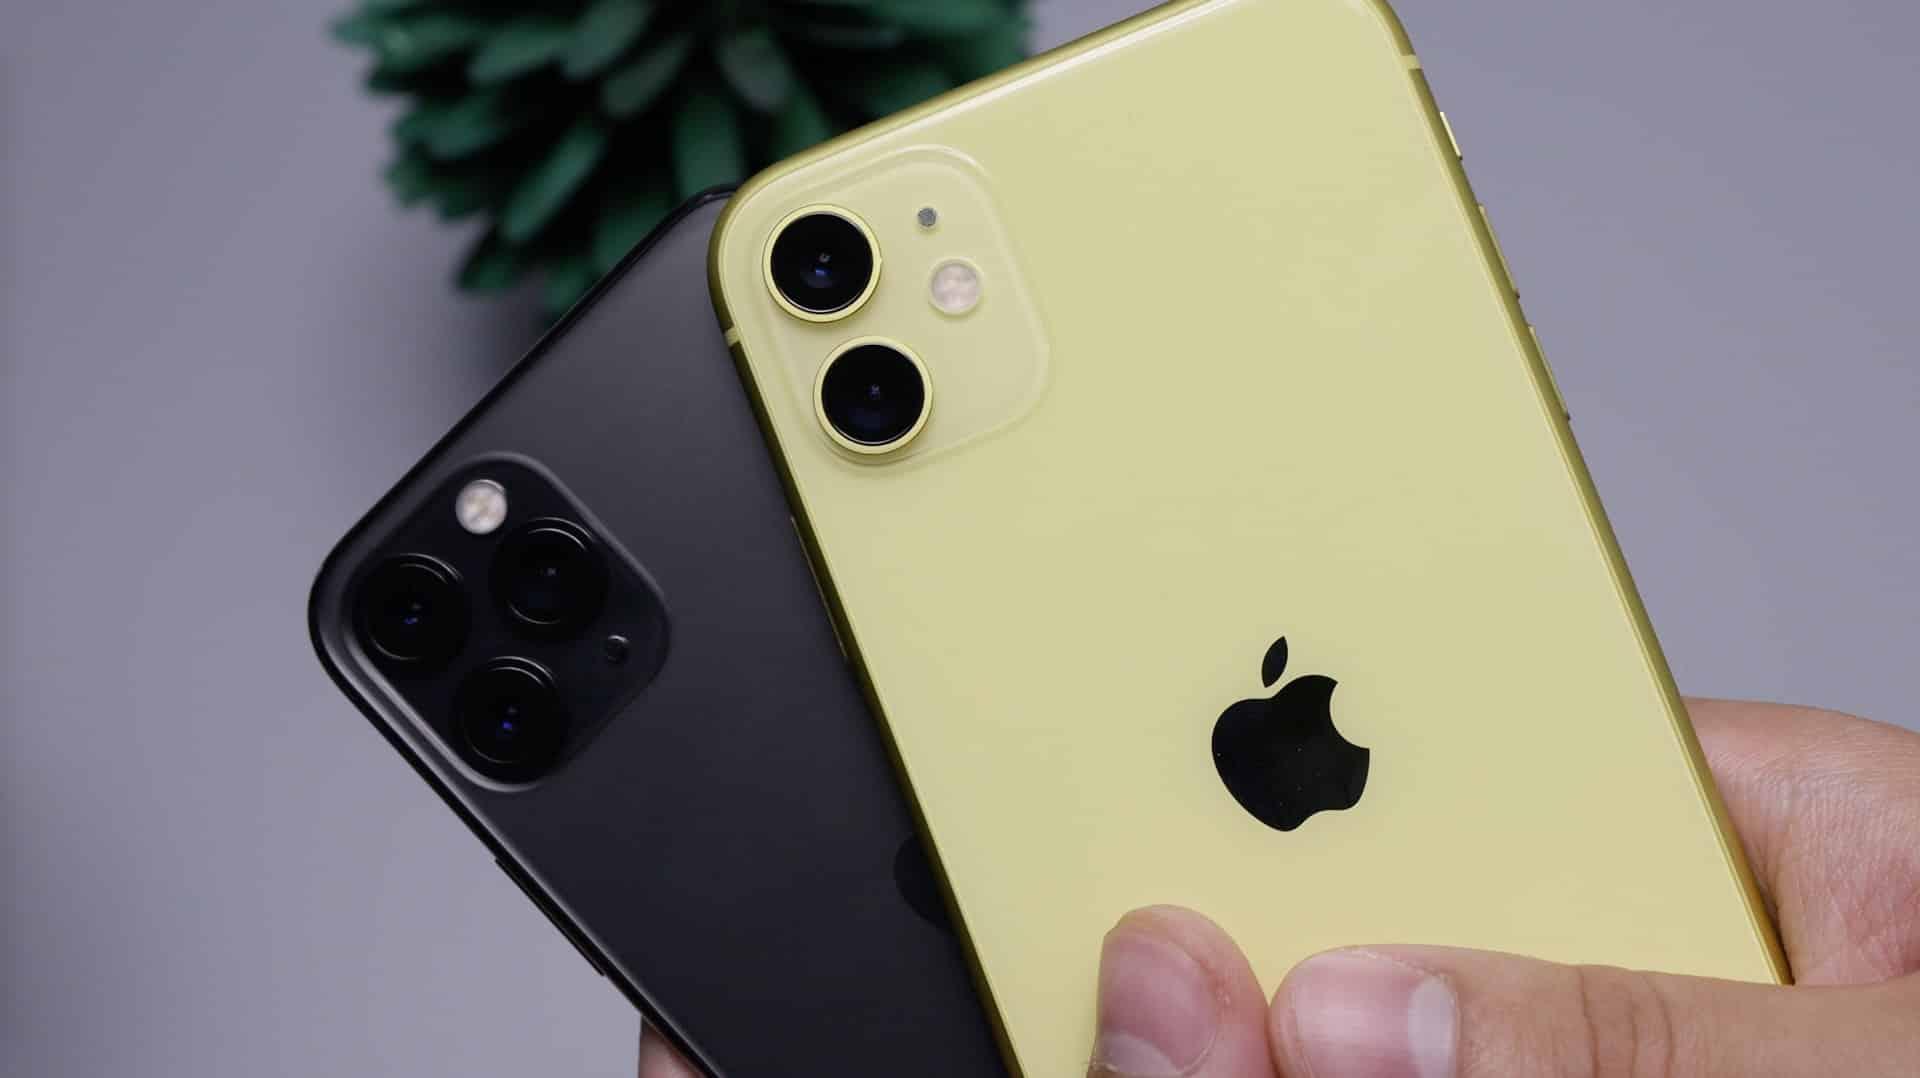 Cara-Cek-Garansi-iPhone-Lewat-IMEI-dan-Jenis-jenisnya